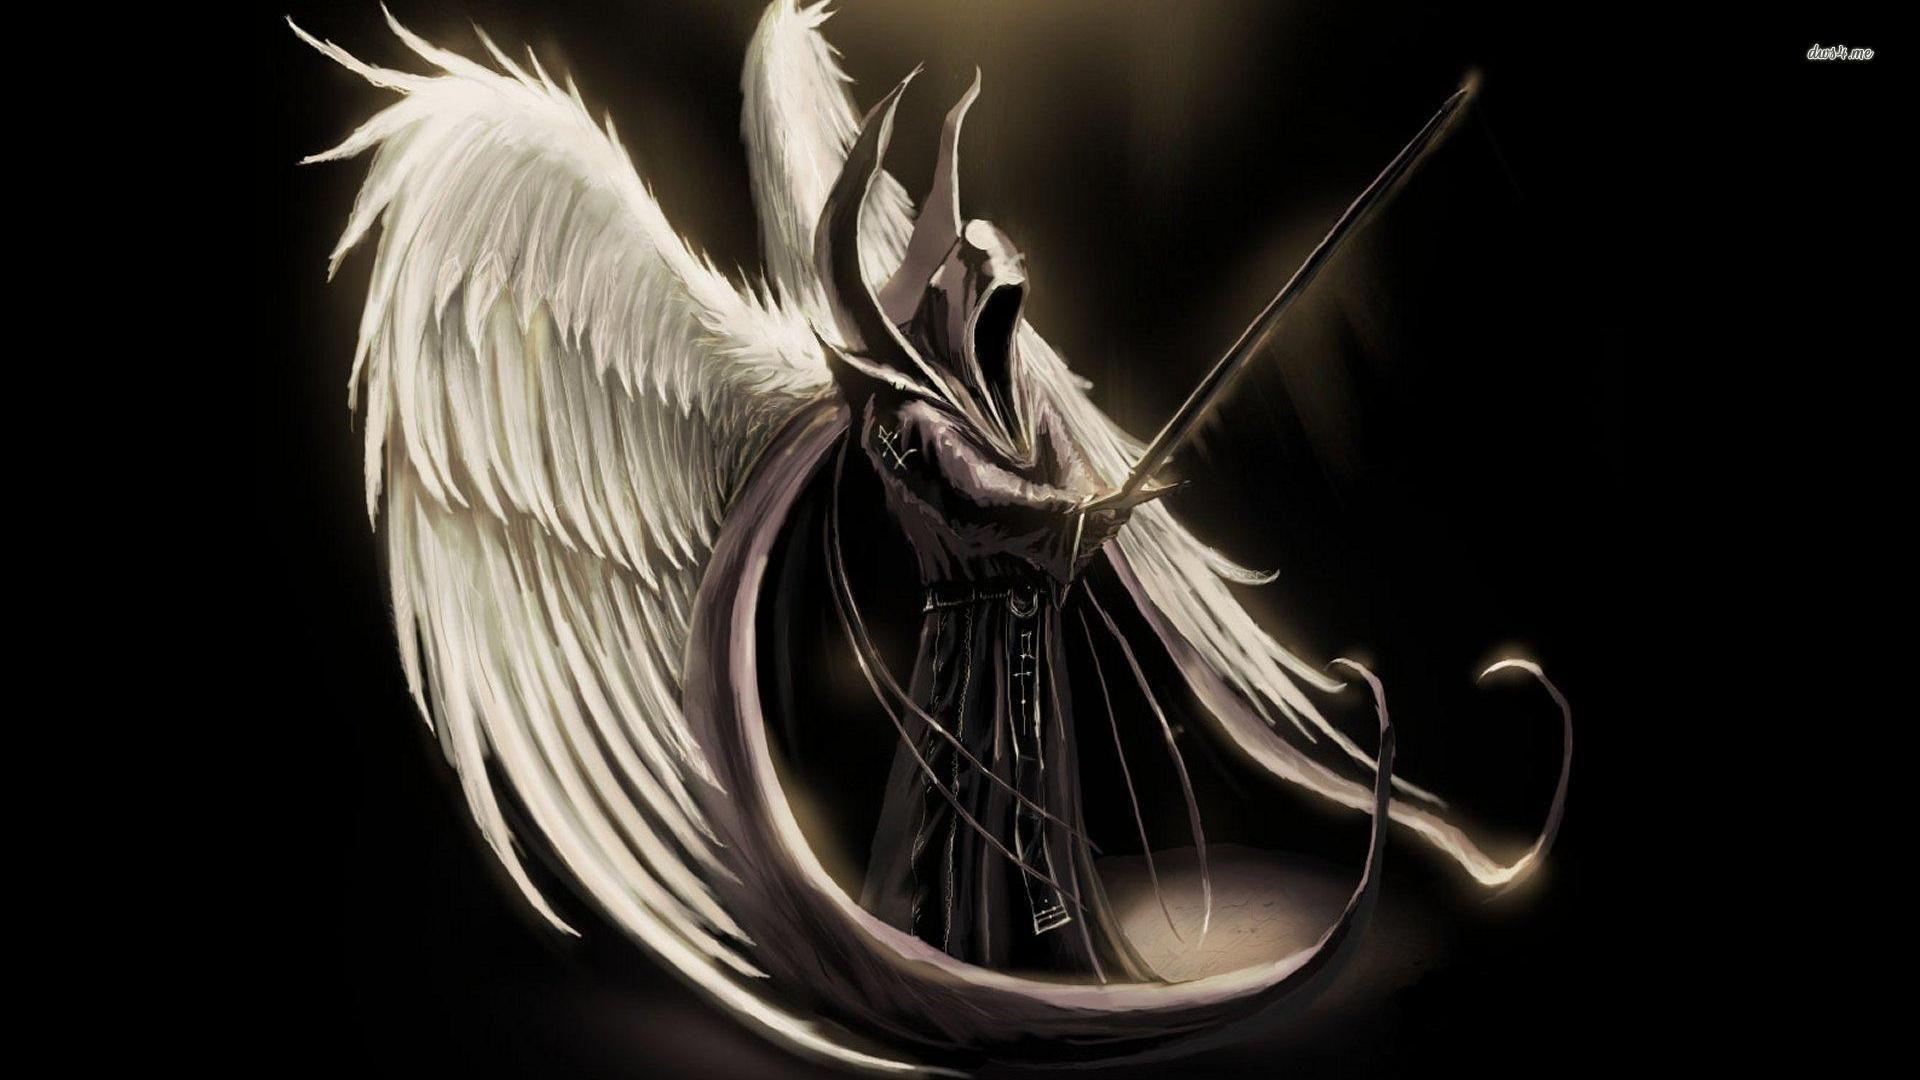 Warrior Angel Warrior Angel Wallpaper 1920x1080 Warrior Angel Wallpaper 1920x1200 Fallen Angel Art Dark Angel Wallpaper Angel Wallpaper